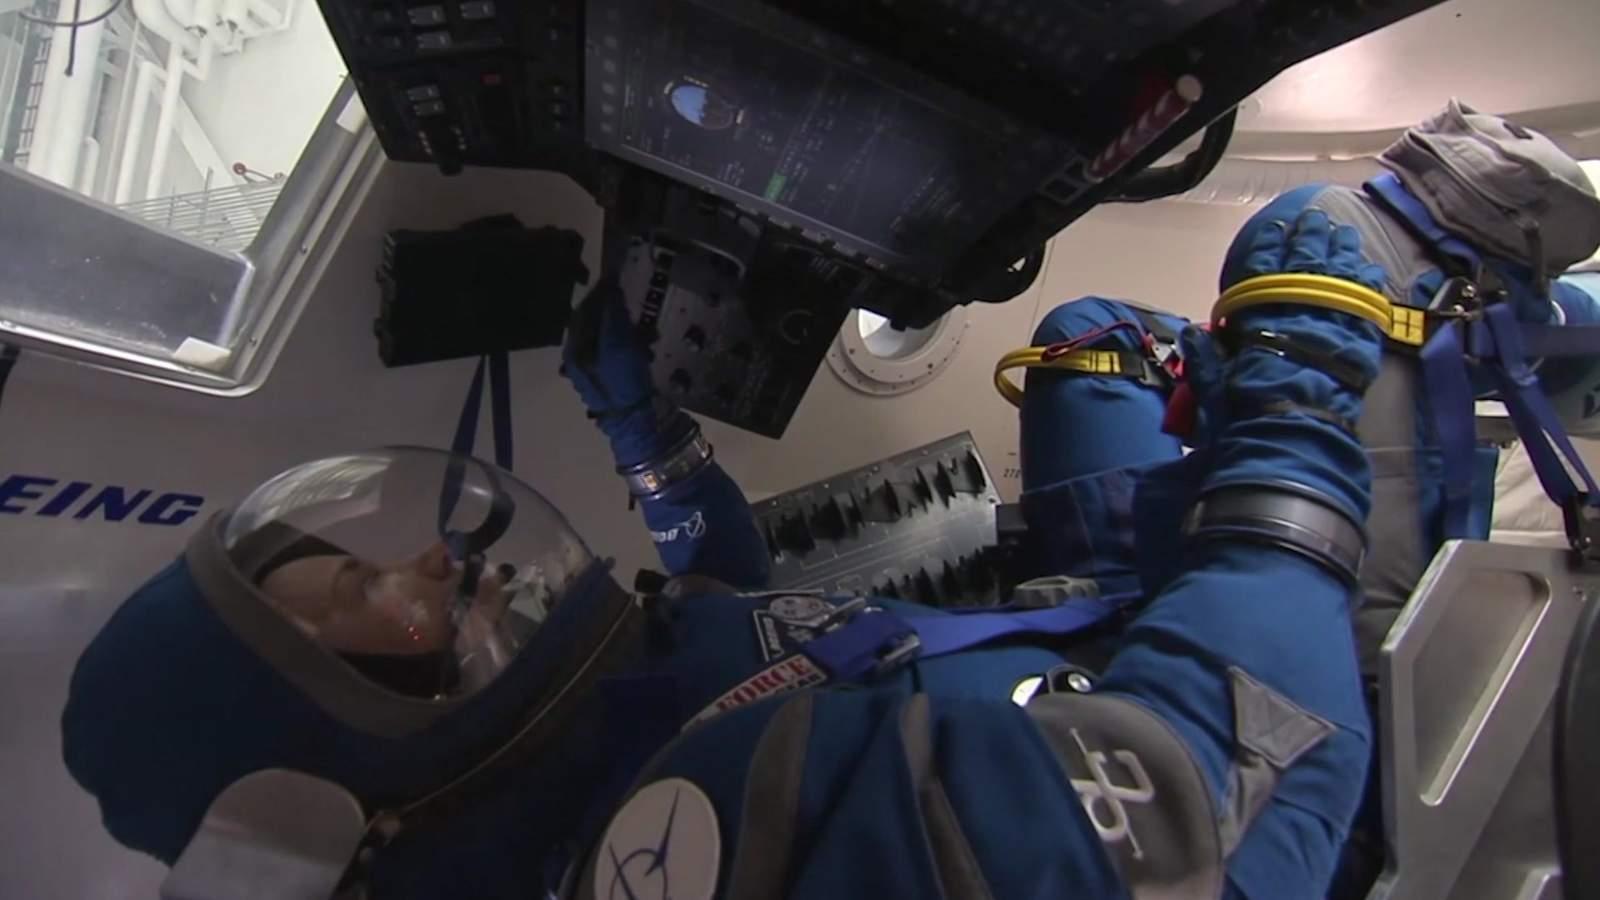 Take a look inside NASAs commercial crew program